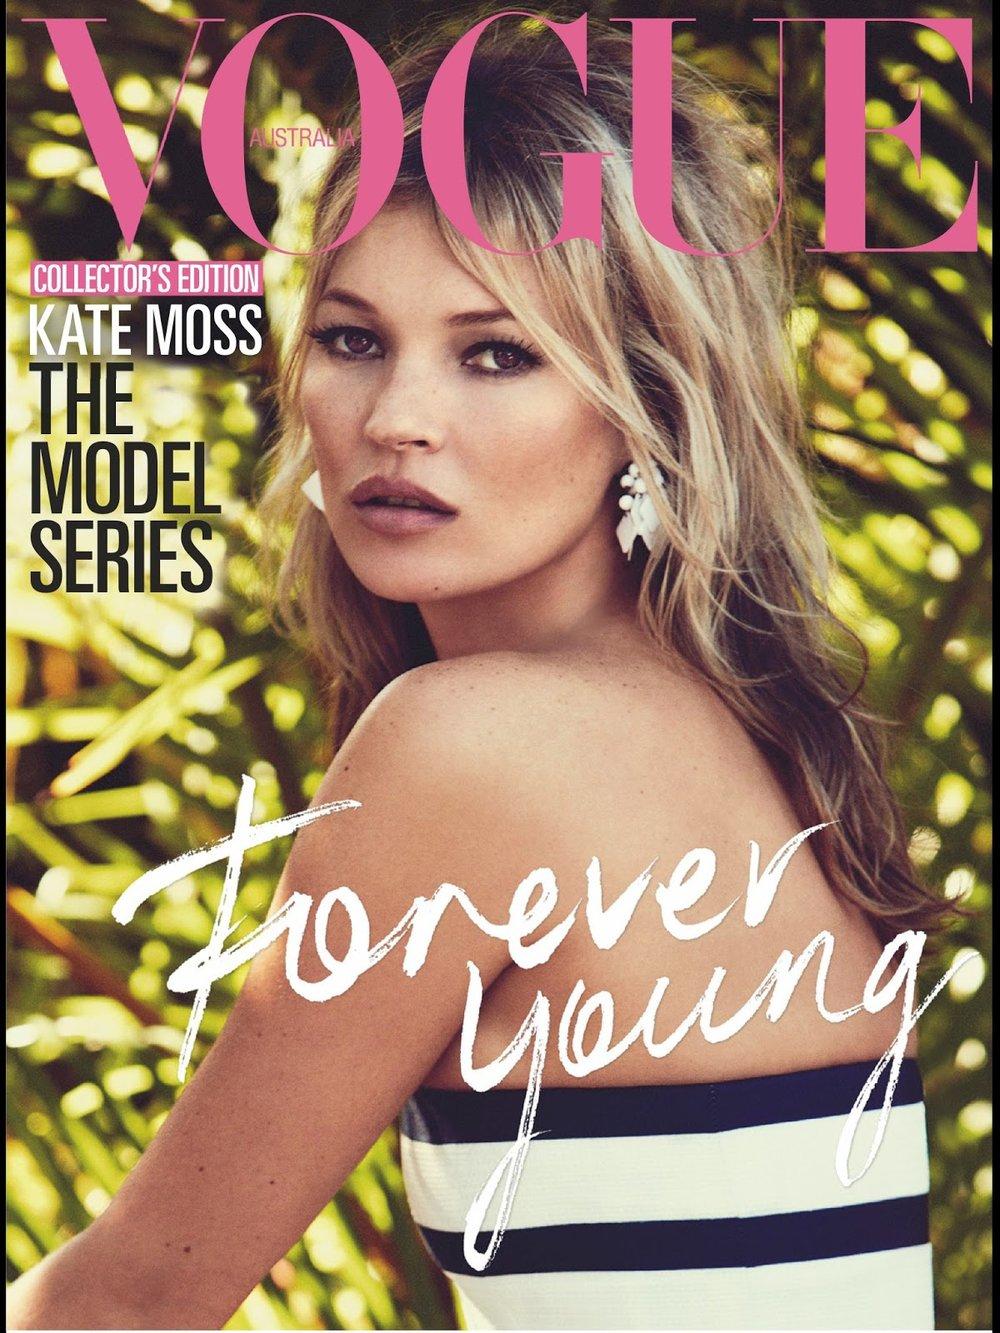 Vogue Australia July 2013